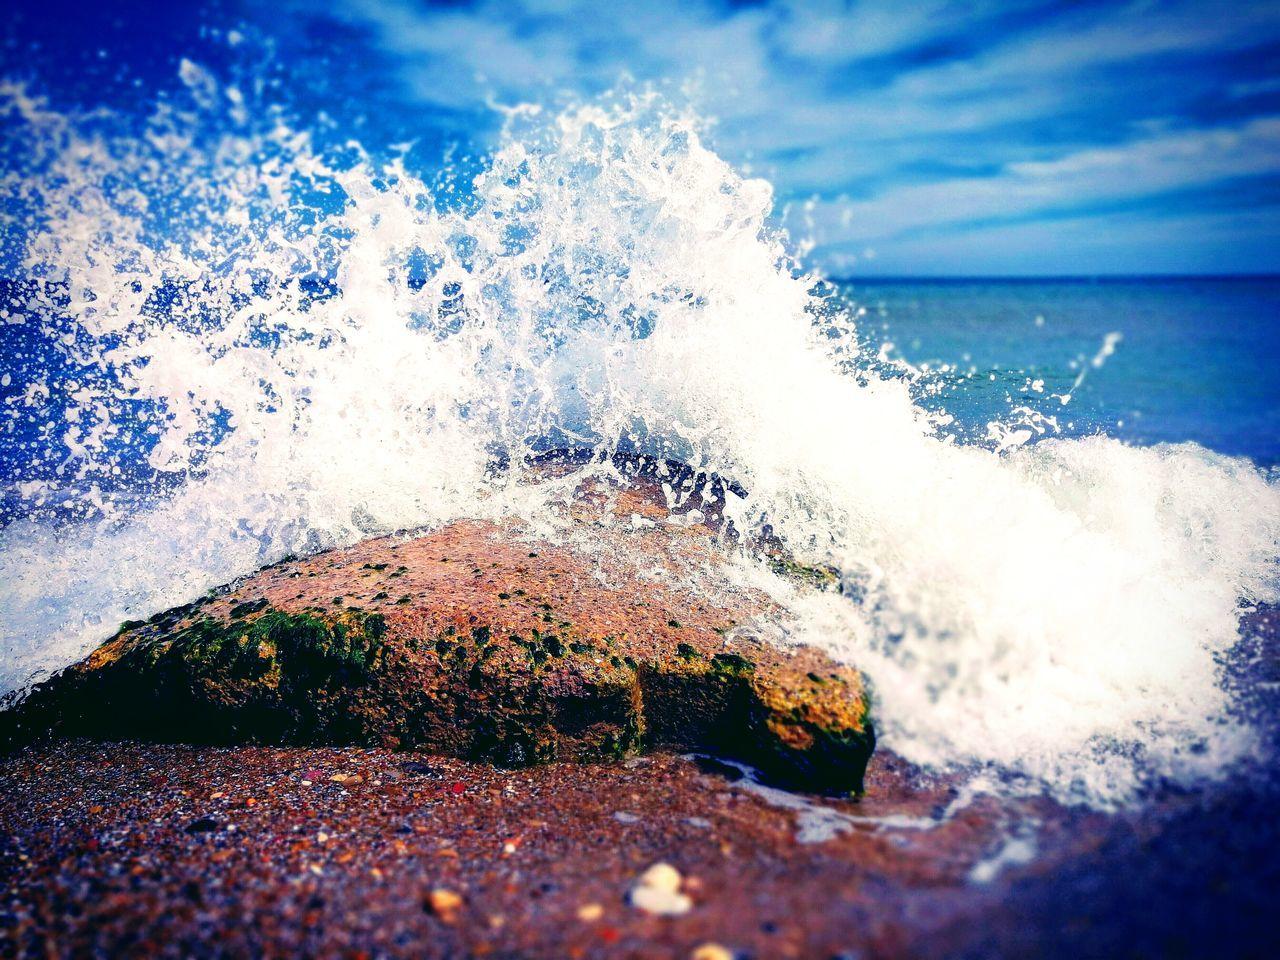 WAVES SPLASHING ON SHORE AT BEACH